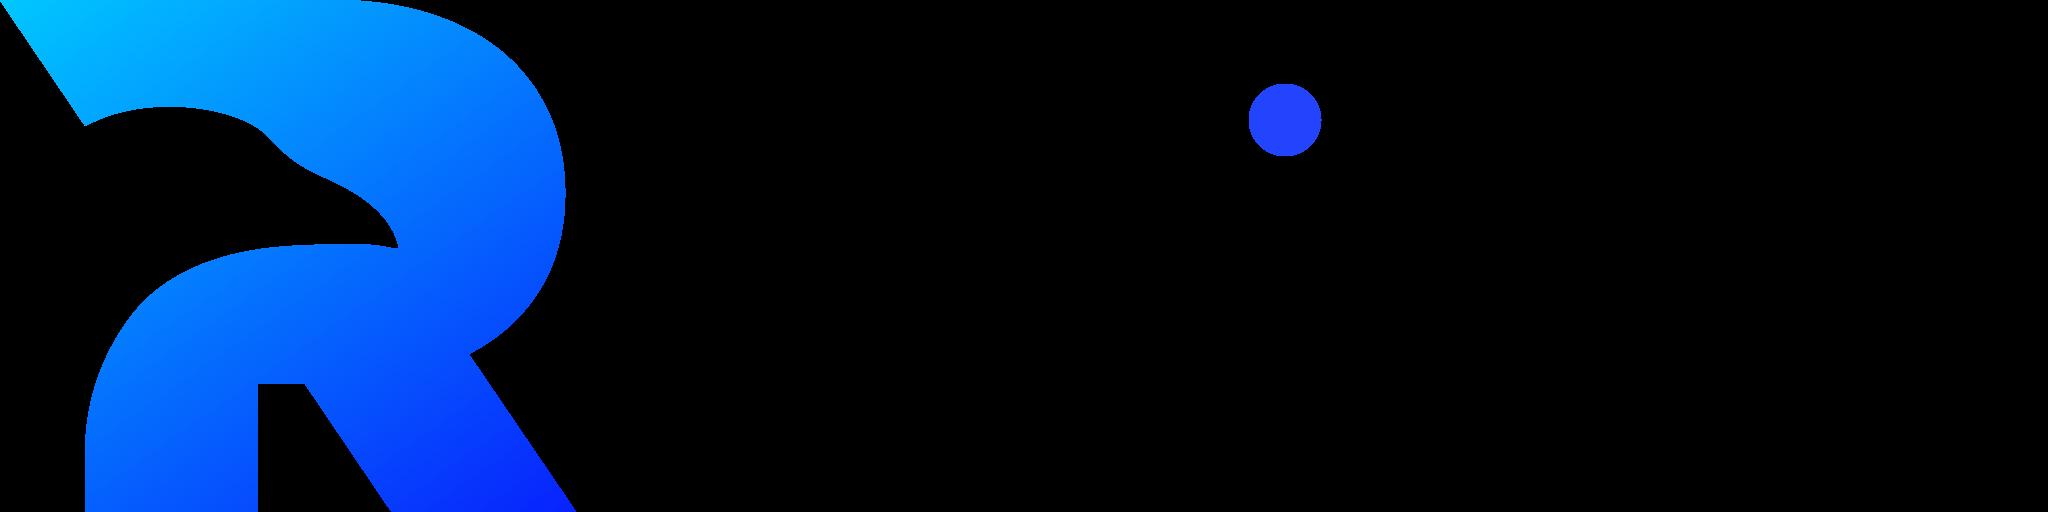 Raiven-Wordmark-Gradient-Black-Large